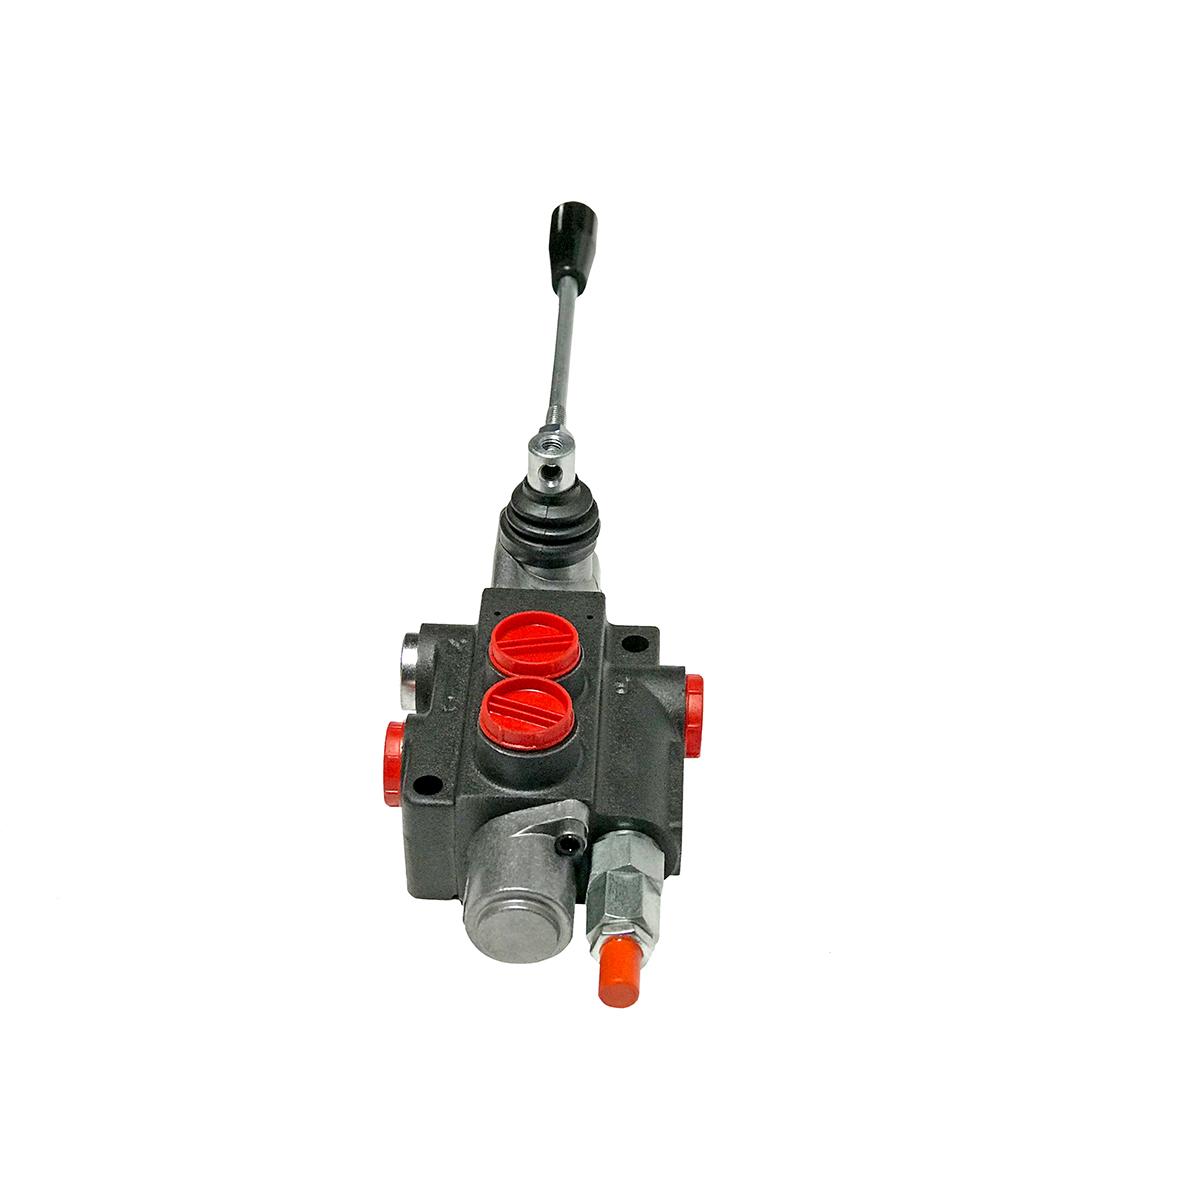 1 spool x 21 GPM hydraulic control valve, monoblock cast iron valve | Magister Hydraulics